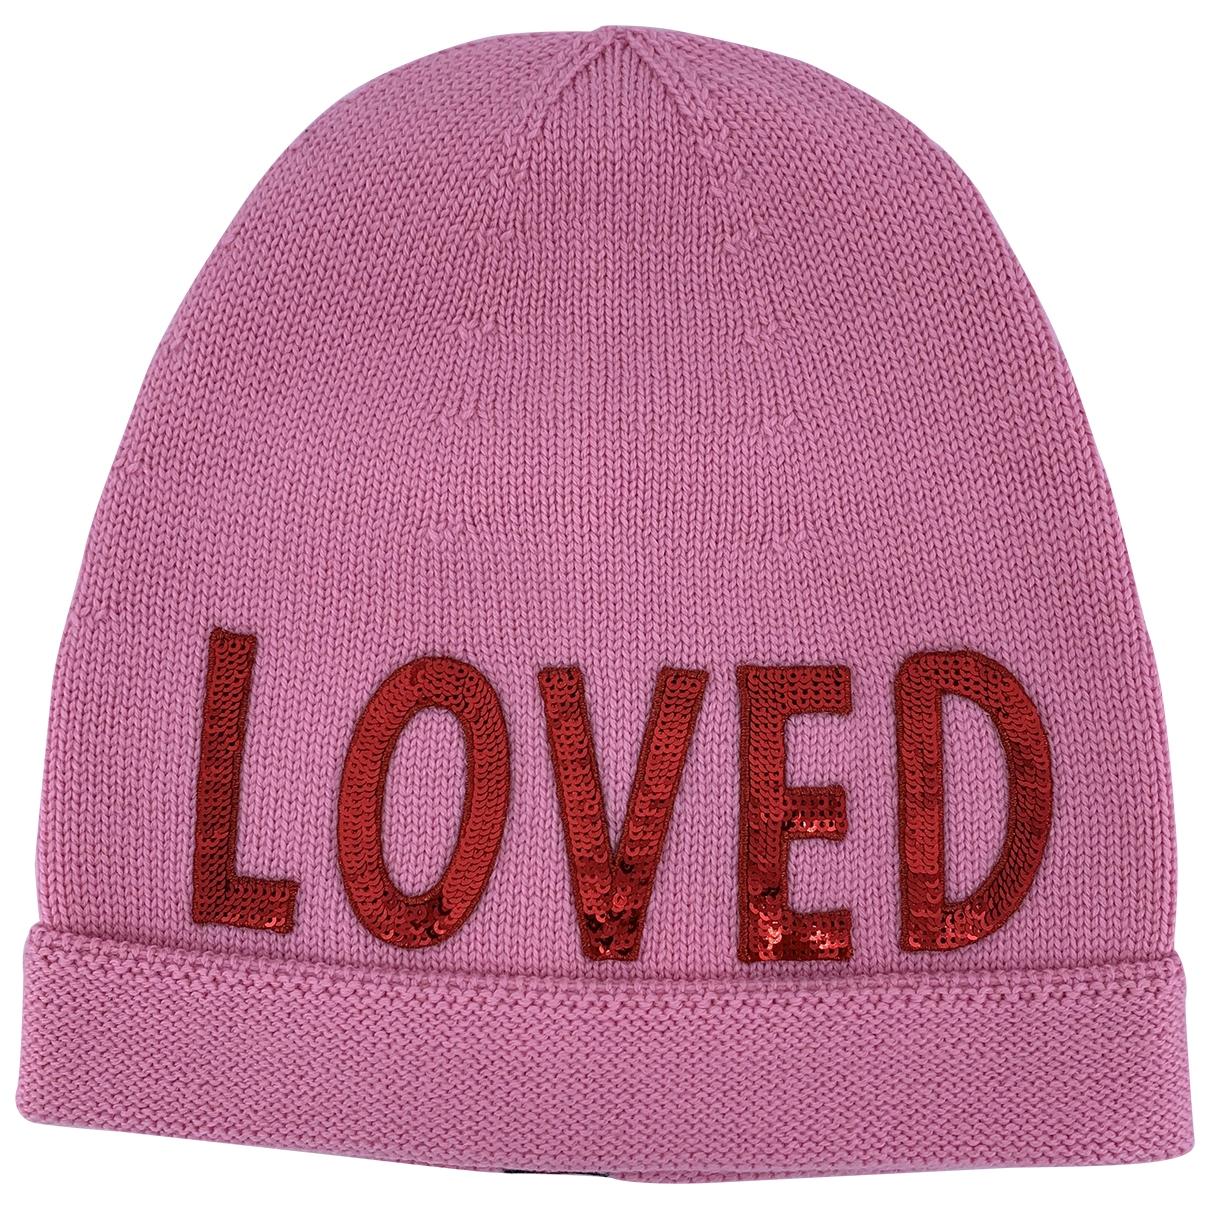 Gucci \N Pink Wool hat for Women L International